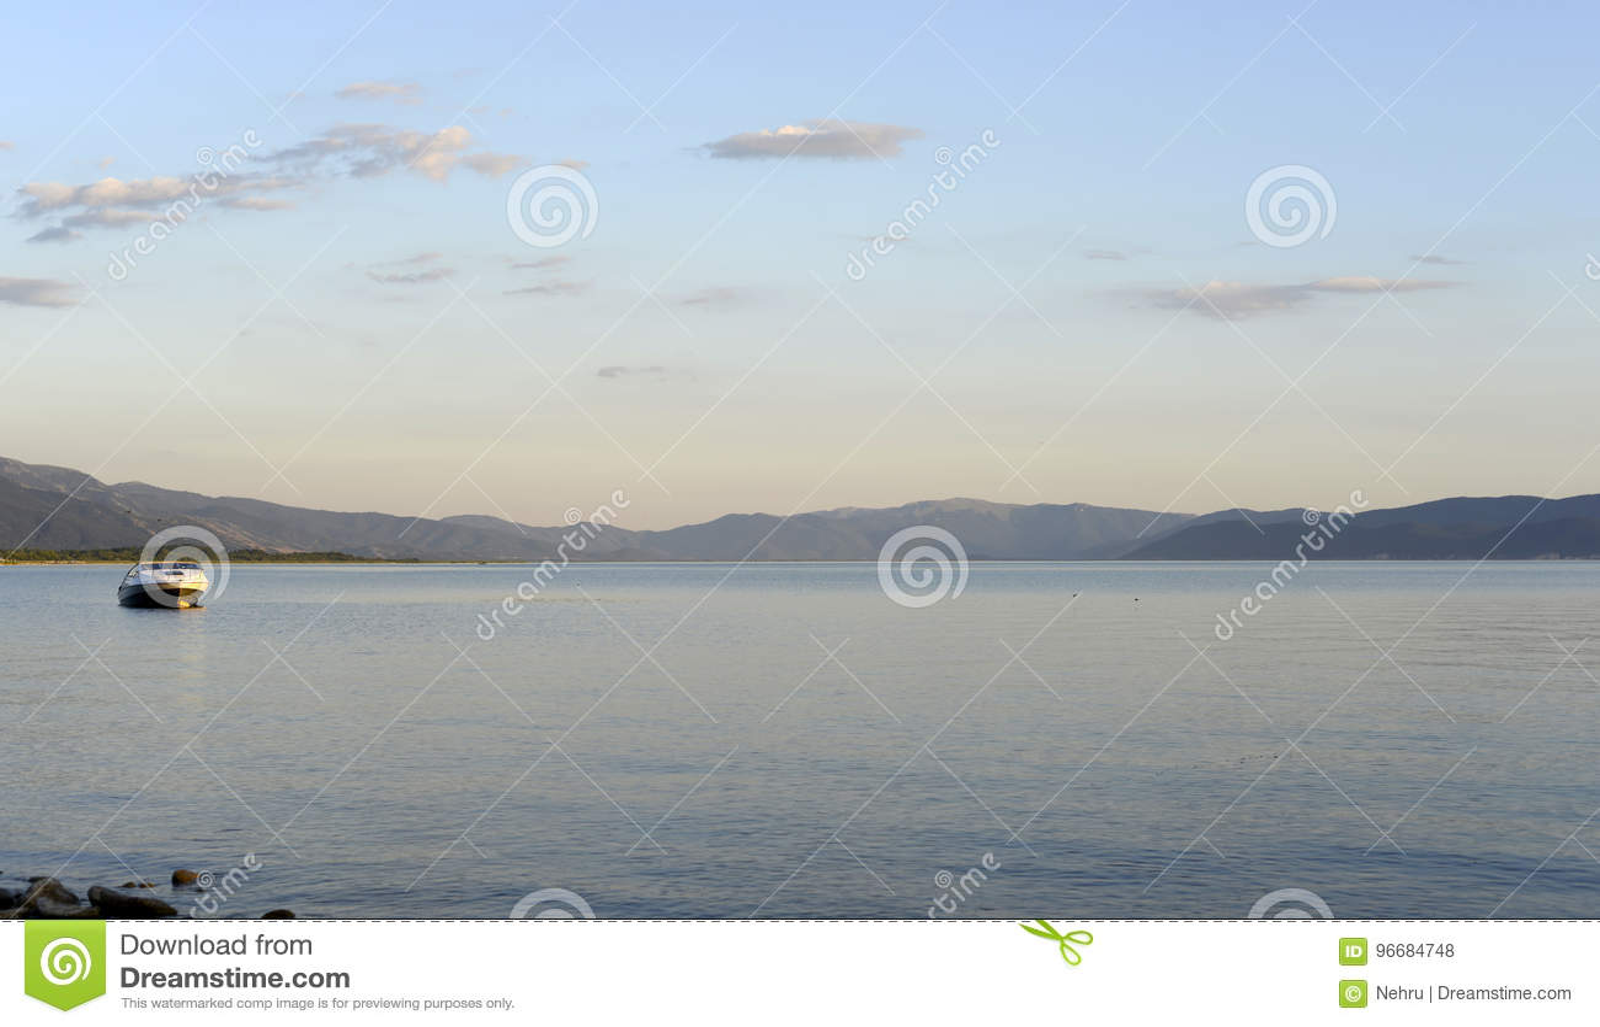 Półmrok scena nad jeziornym prespa w Macedonia,